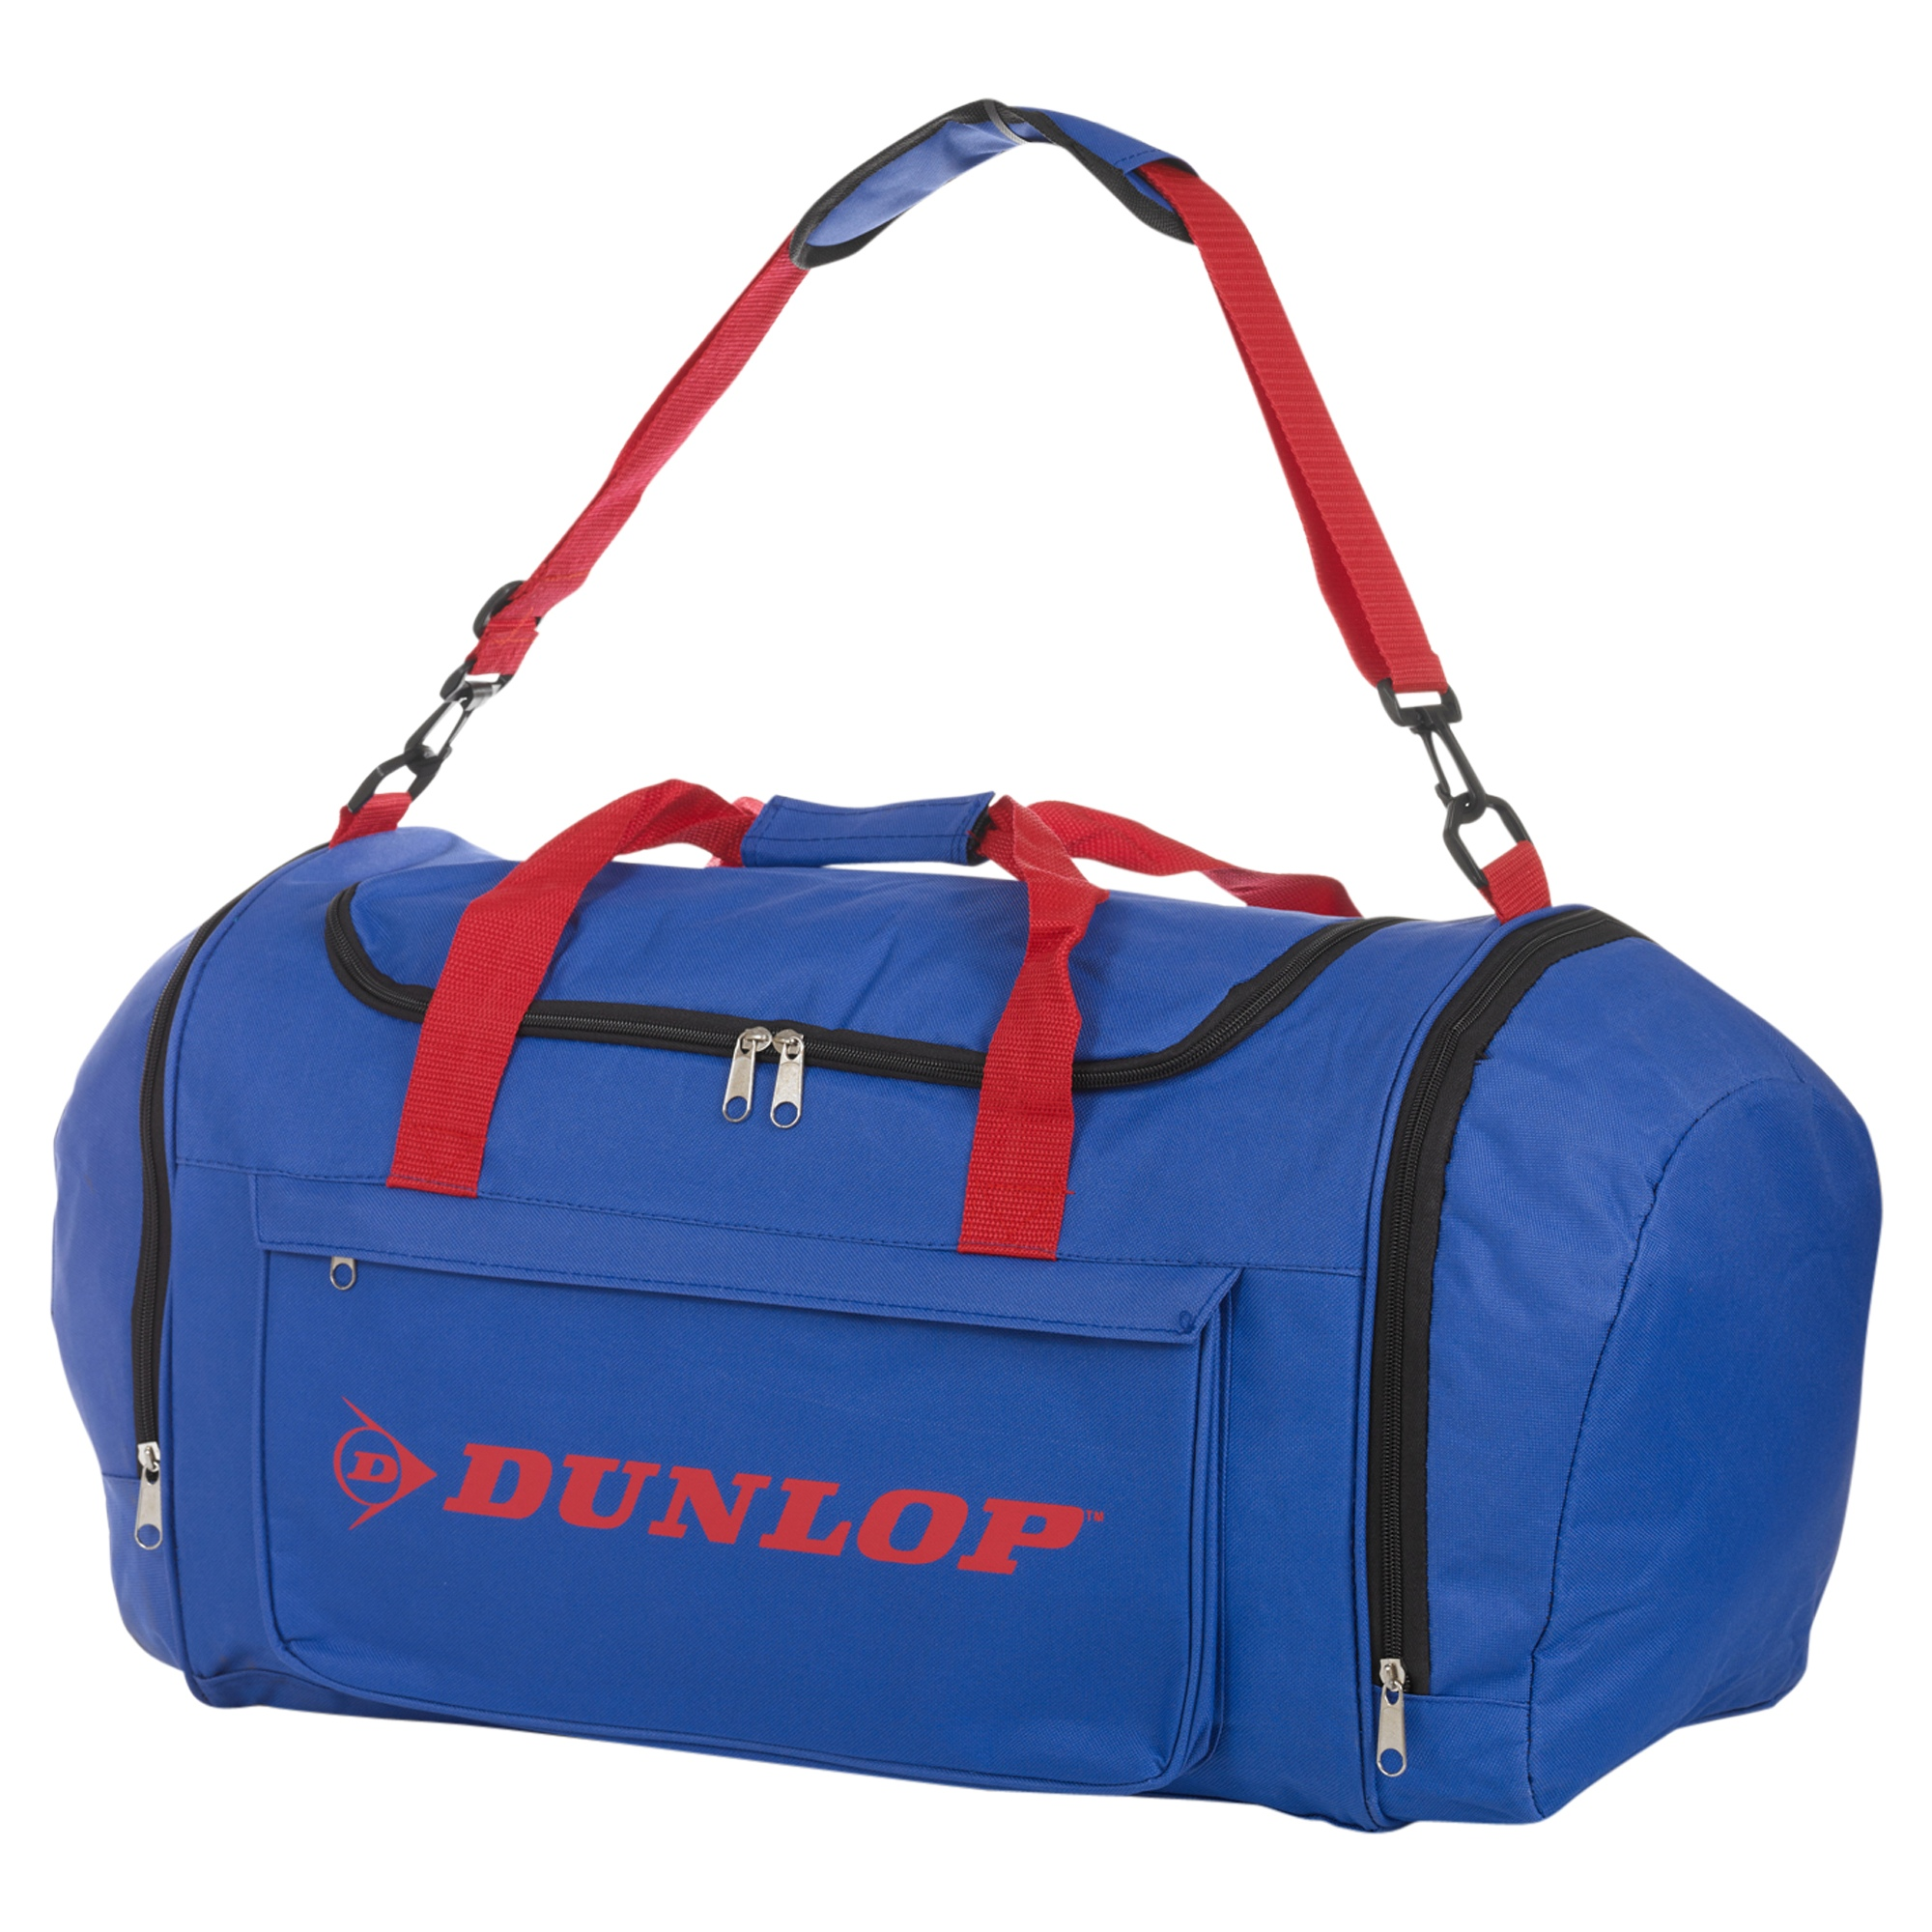 Small Gym Duffel Bag Uk  336a08500c6bb